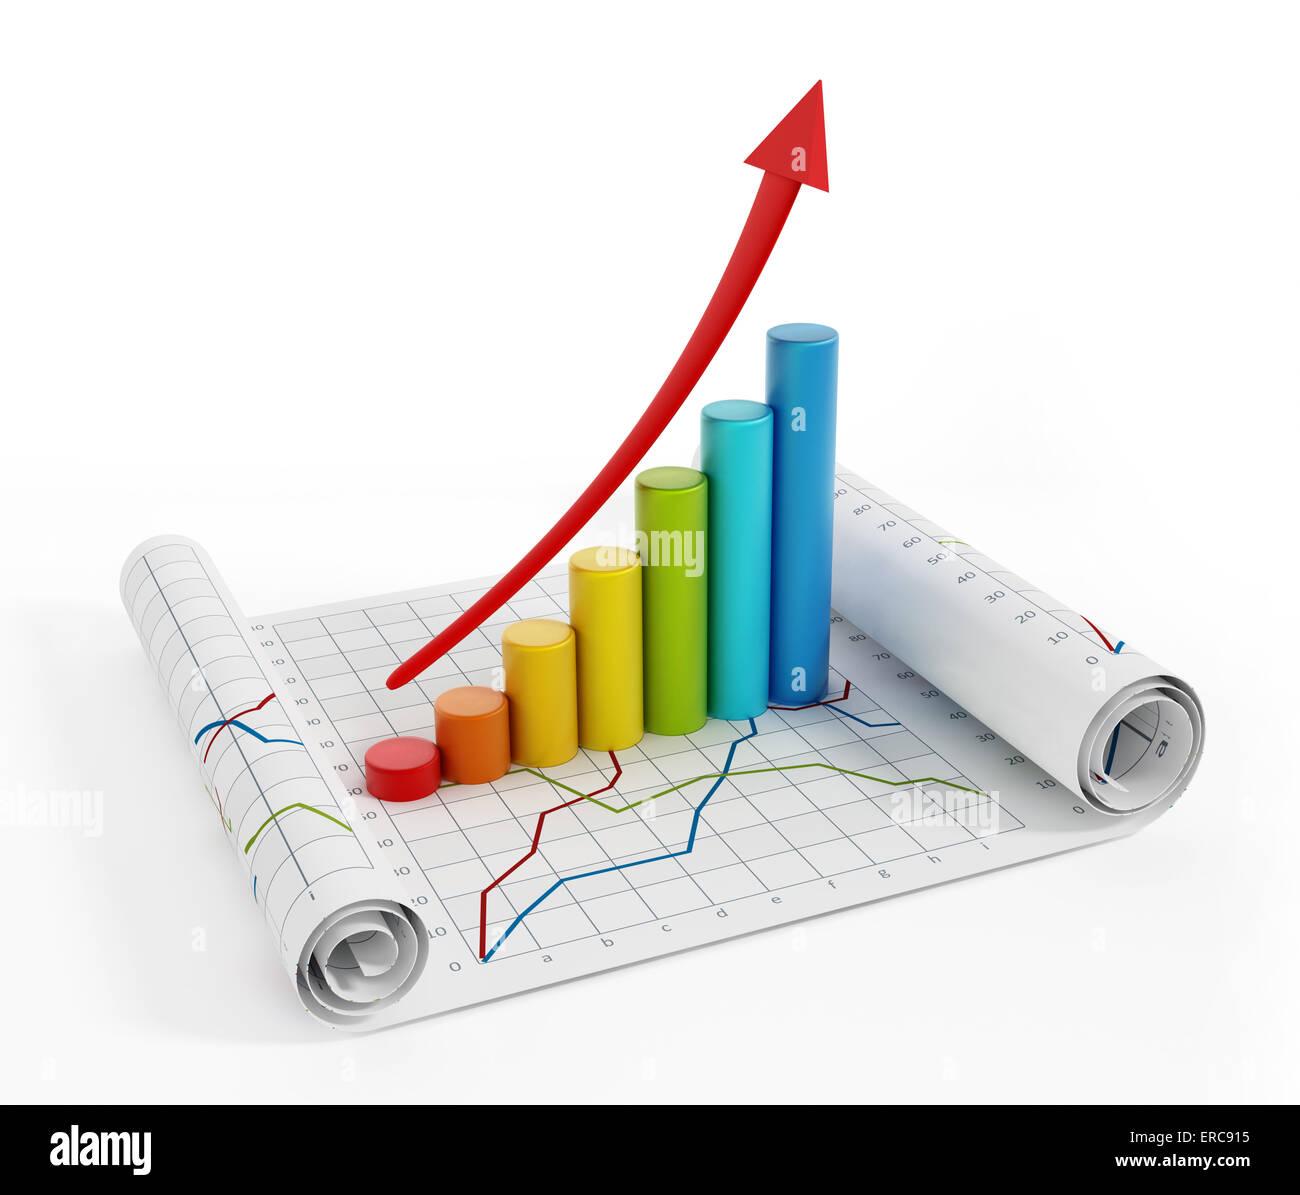 Finanzielle Grafiken Stockbild